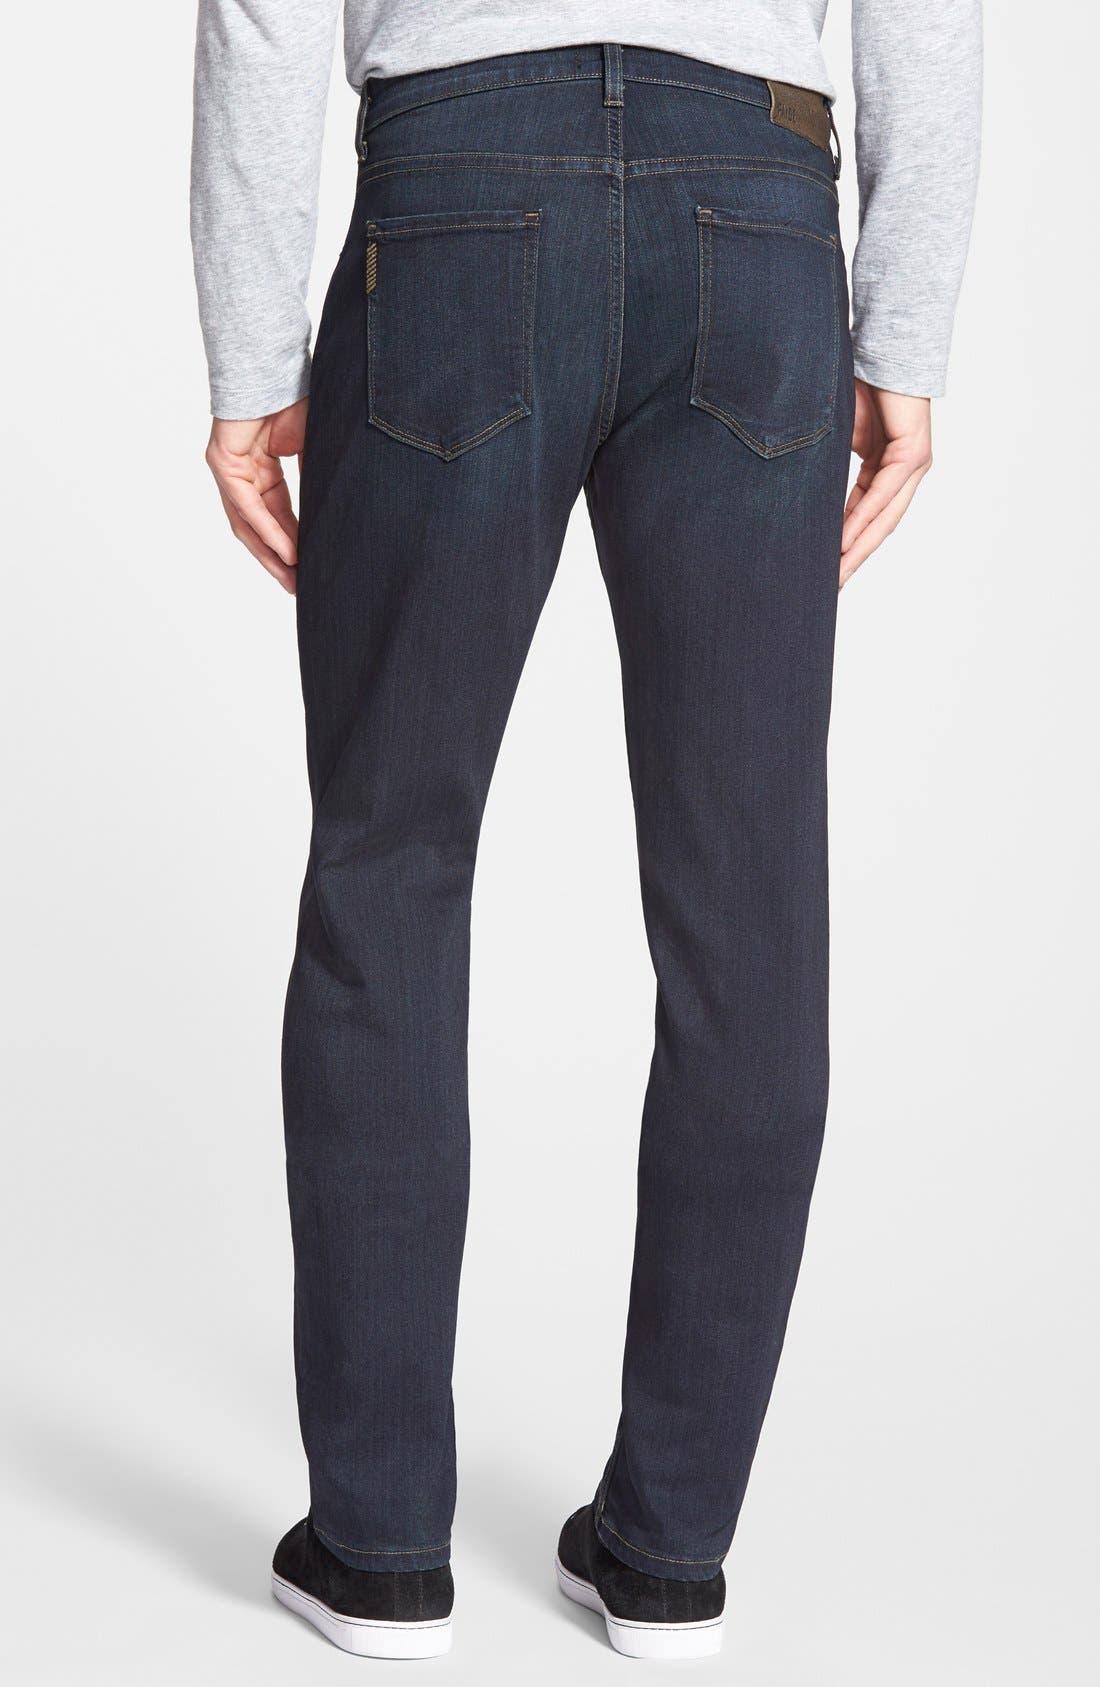 PAIGE, Transcend - Federal Slim Straight Leg Jeans, Alternate thumbnail 5, color, CELLAR/ CELLAR